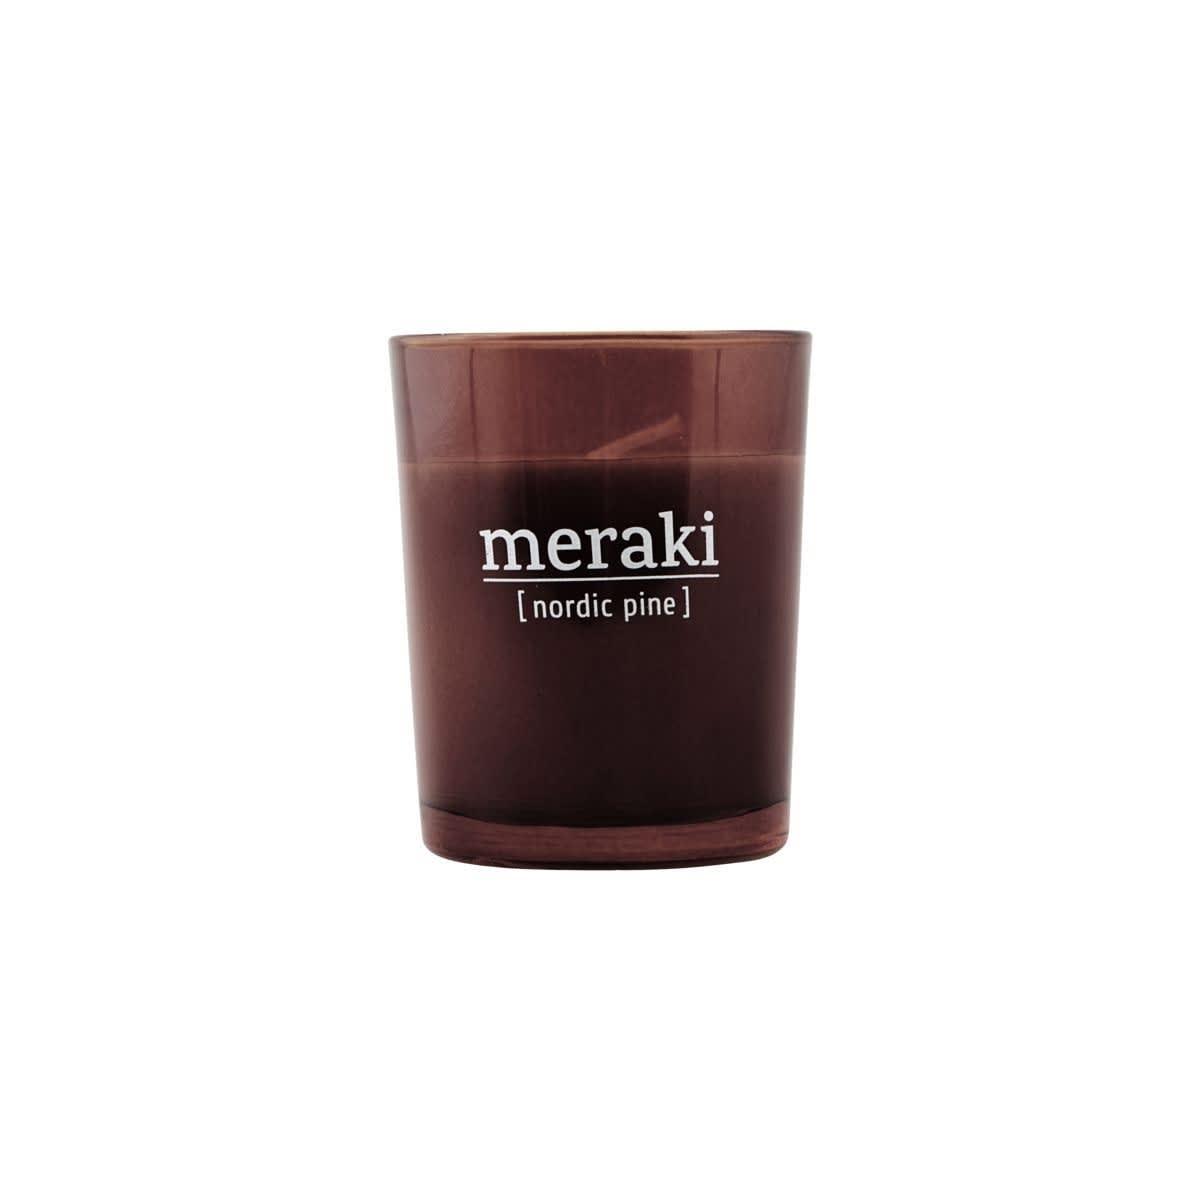 Meraki Small Nordic Pine Candle